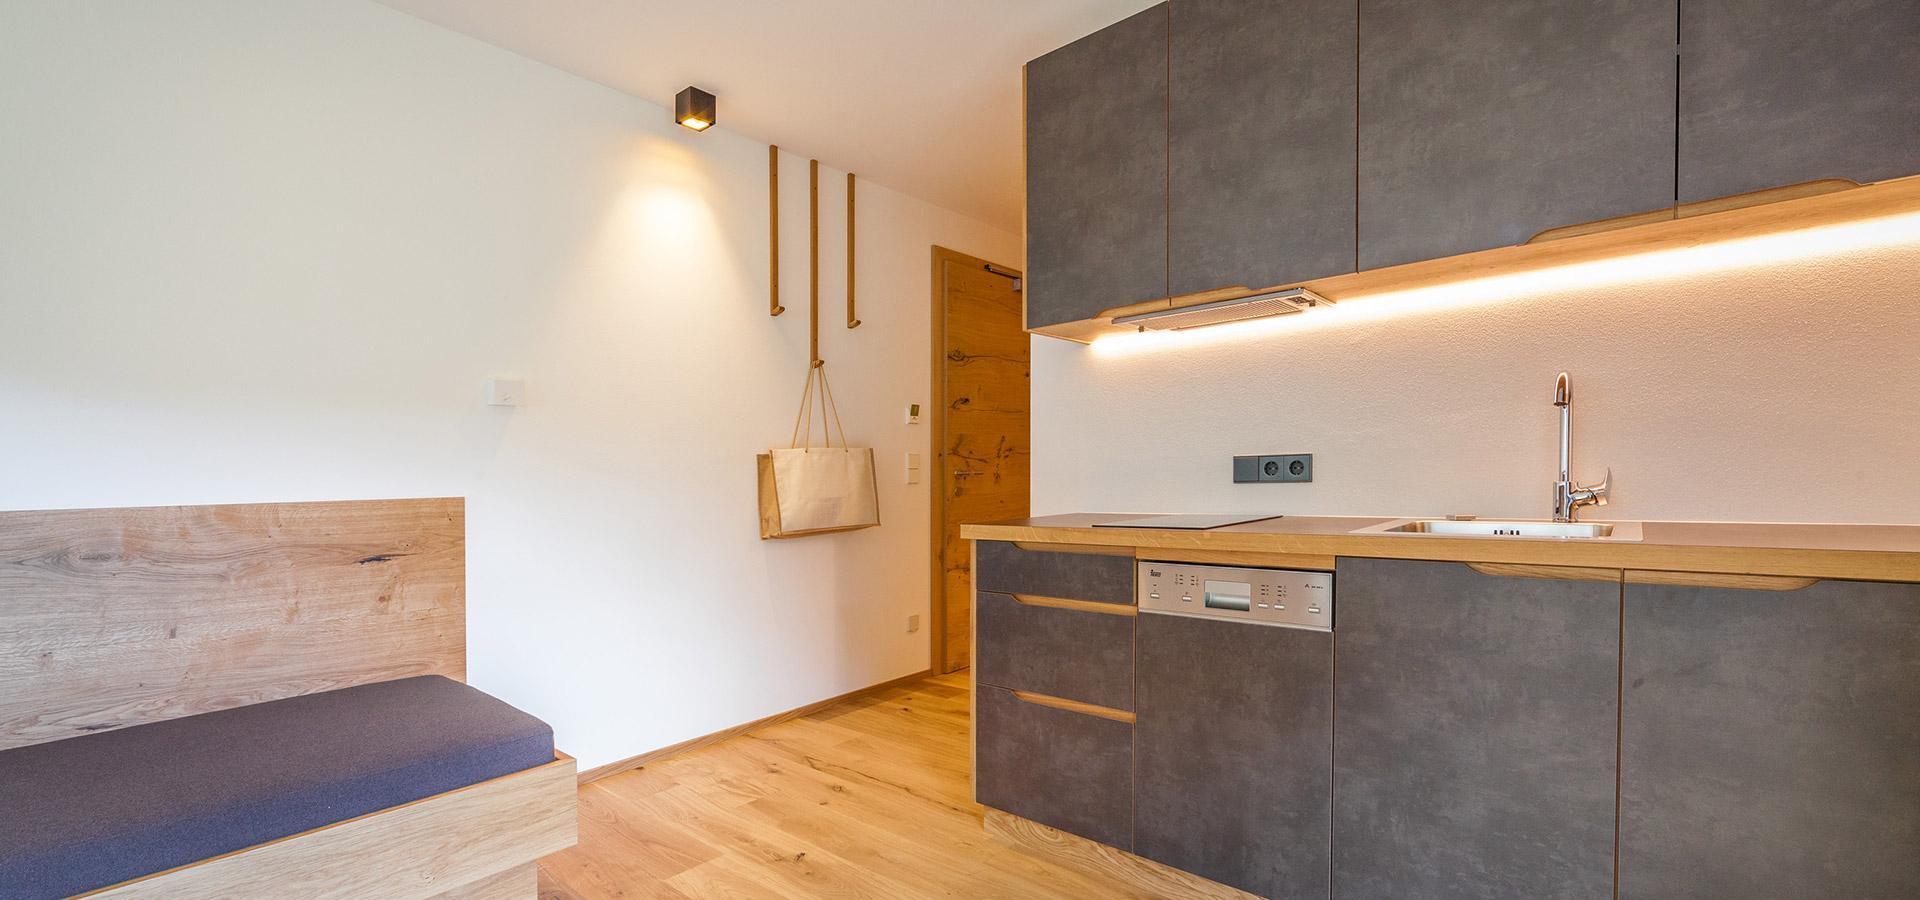 x-stone wand-bodenverkleidung – livingdesign-frankfurt